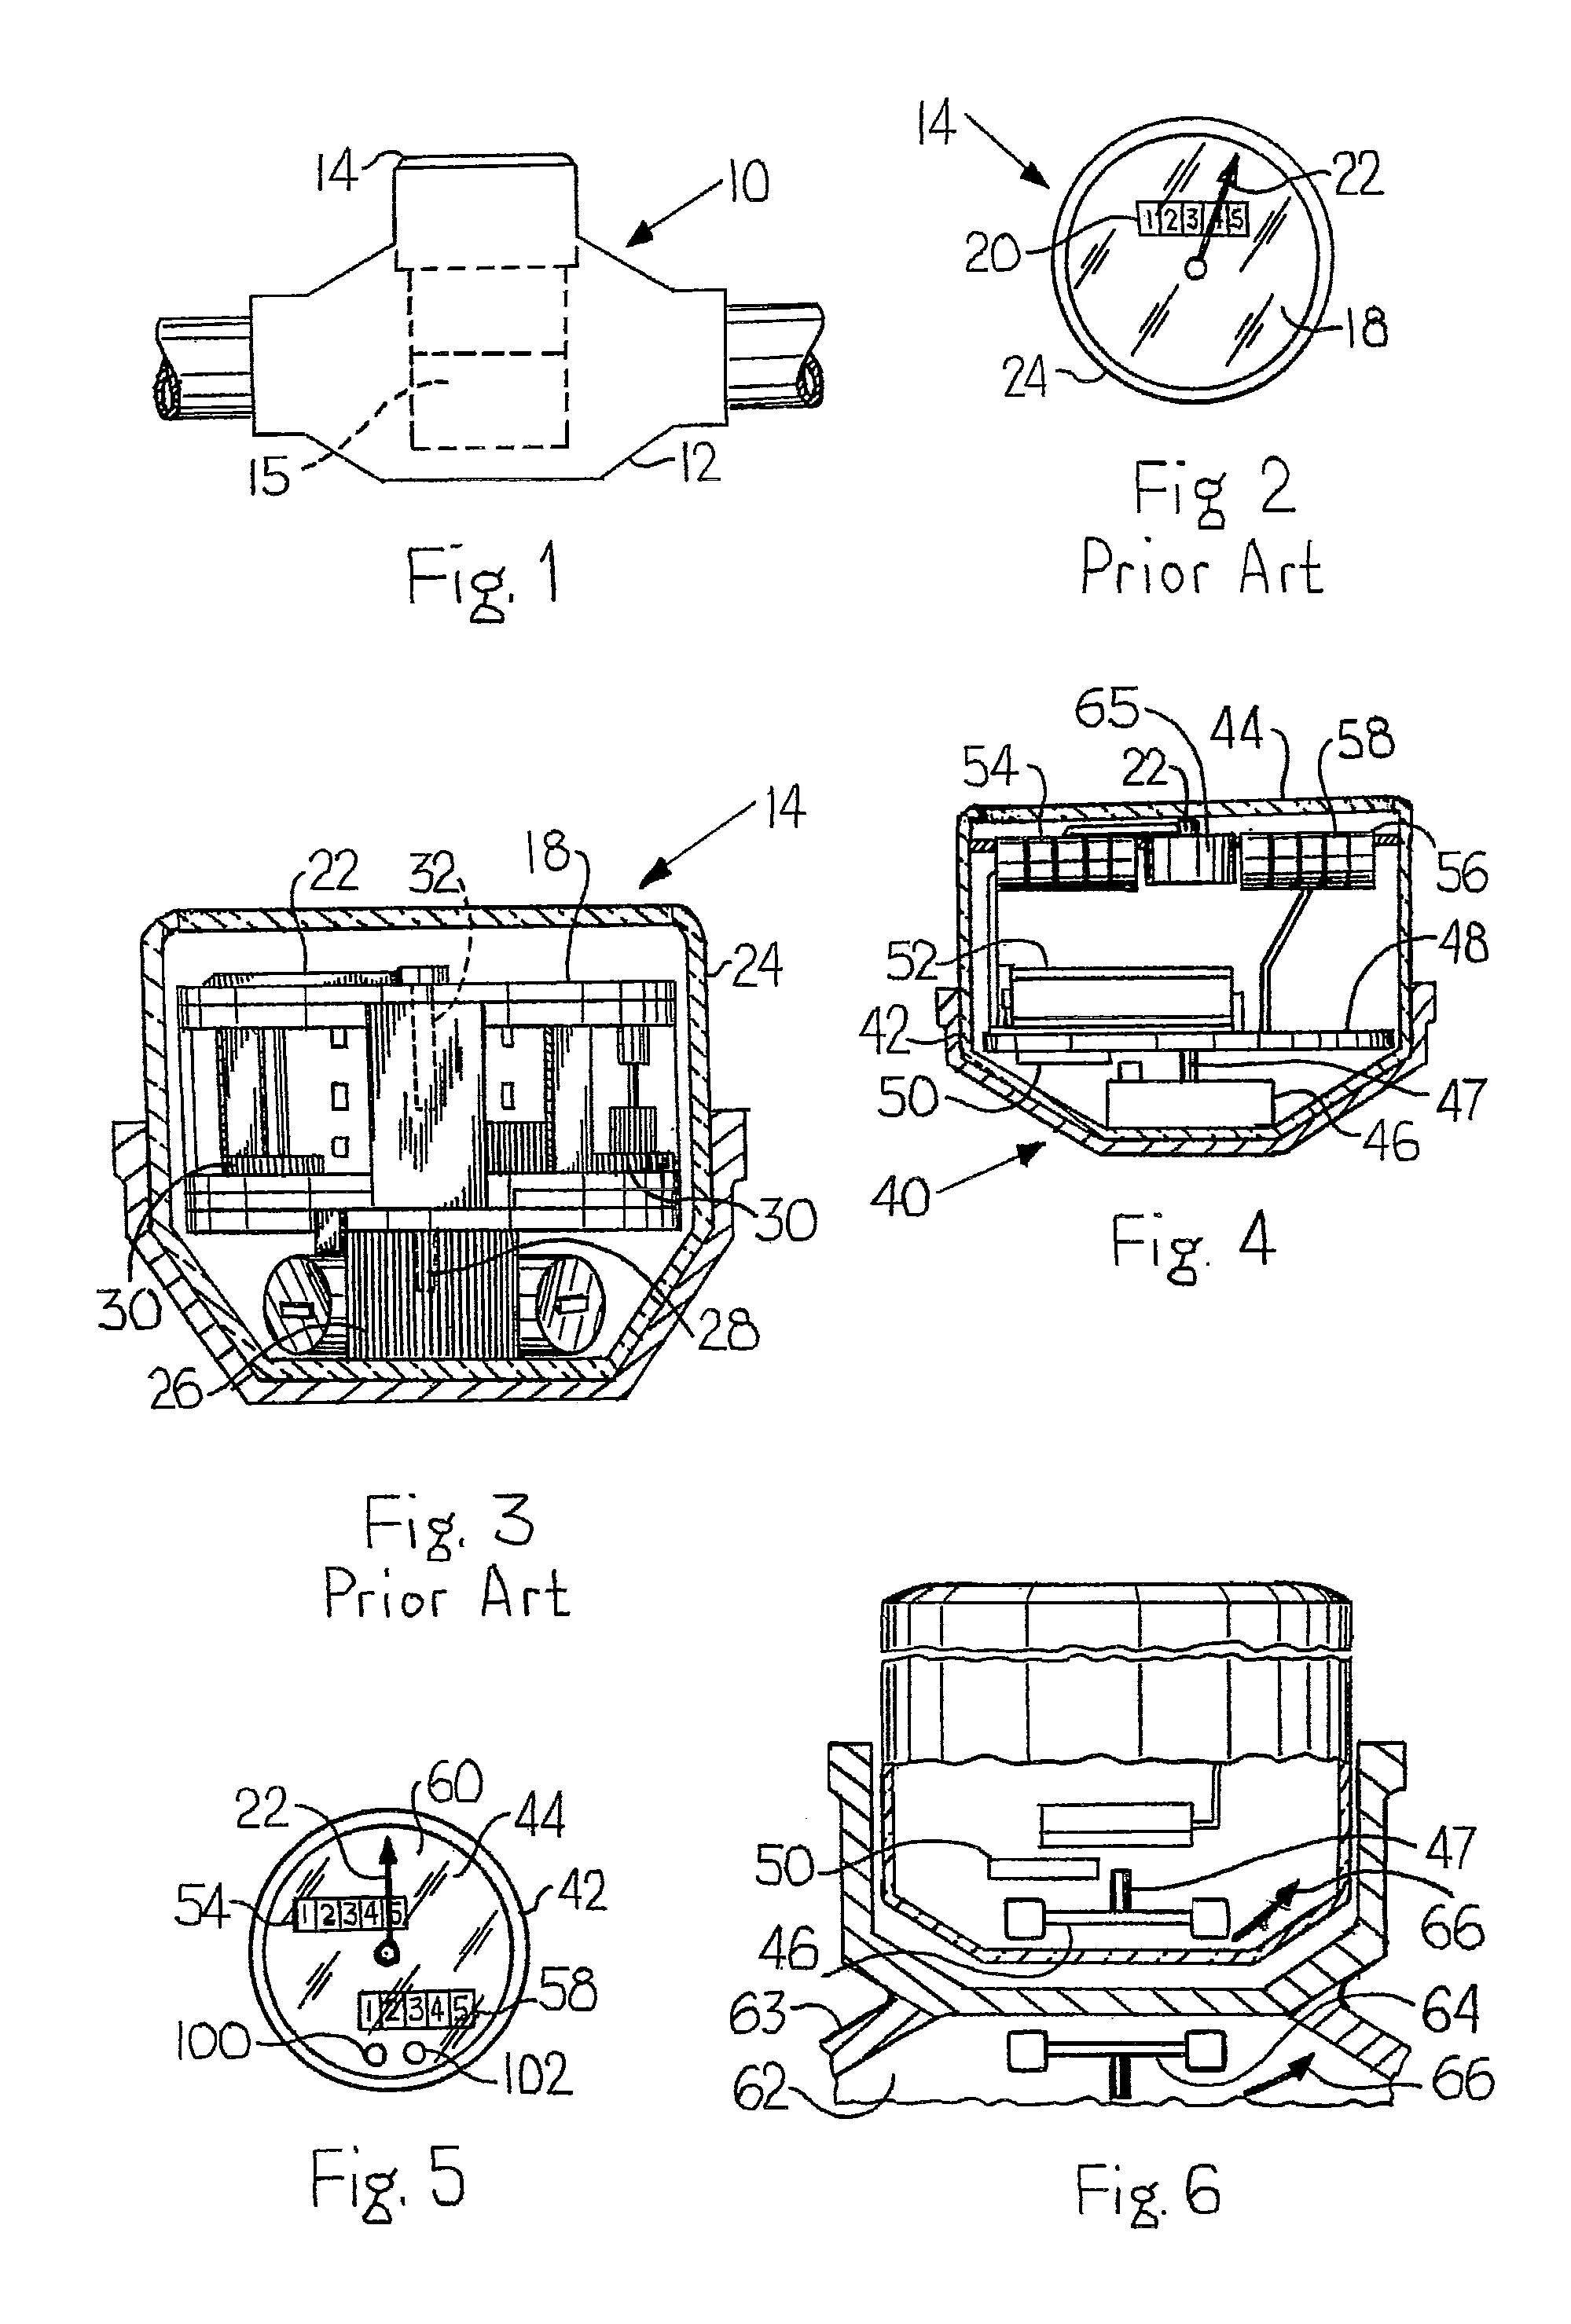 Sensus Water Meter Wiring Diagram